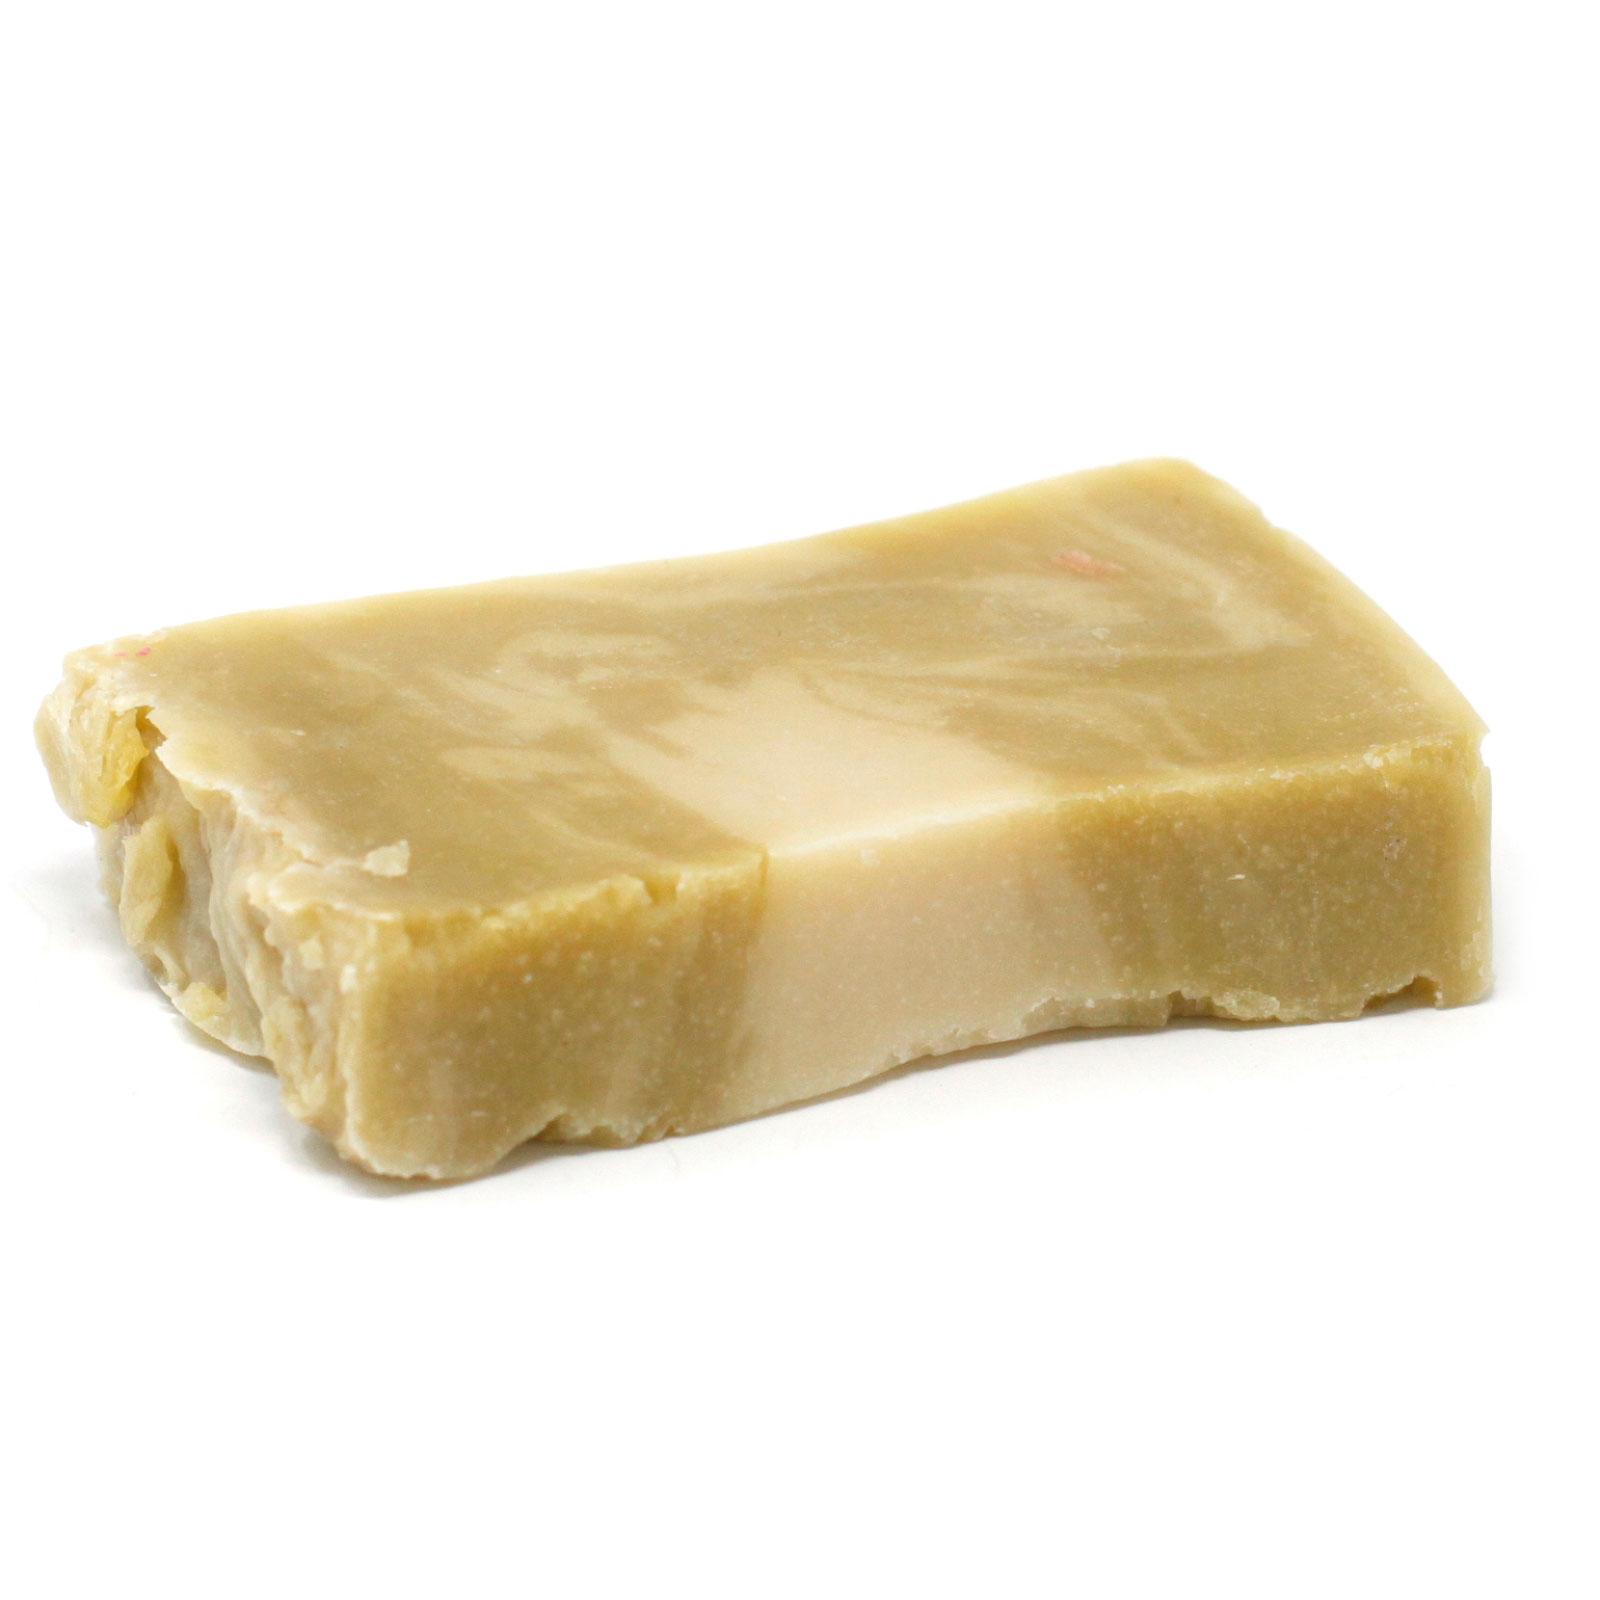 Argan Olive Oil Soap SLICE approx 100g